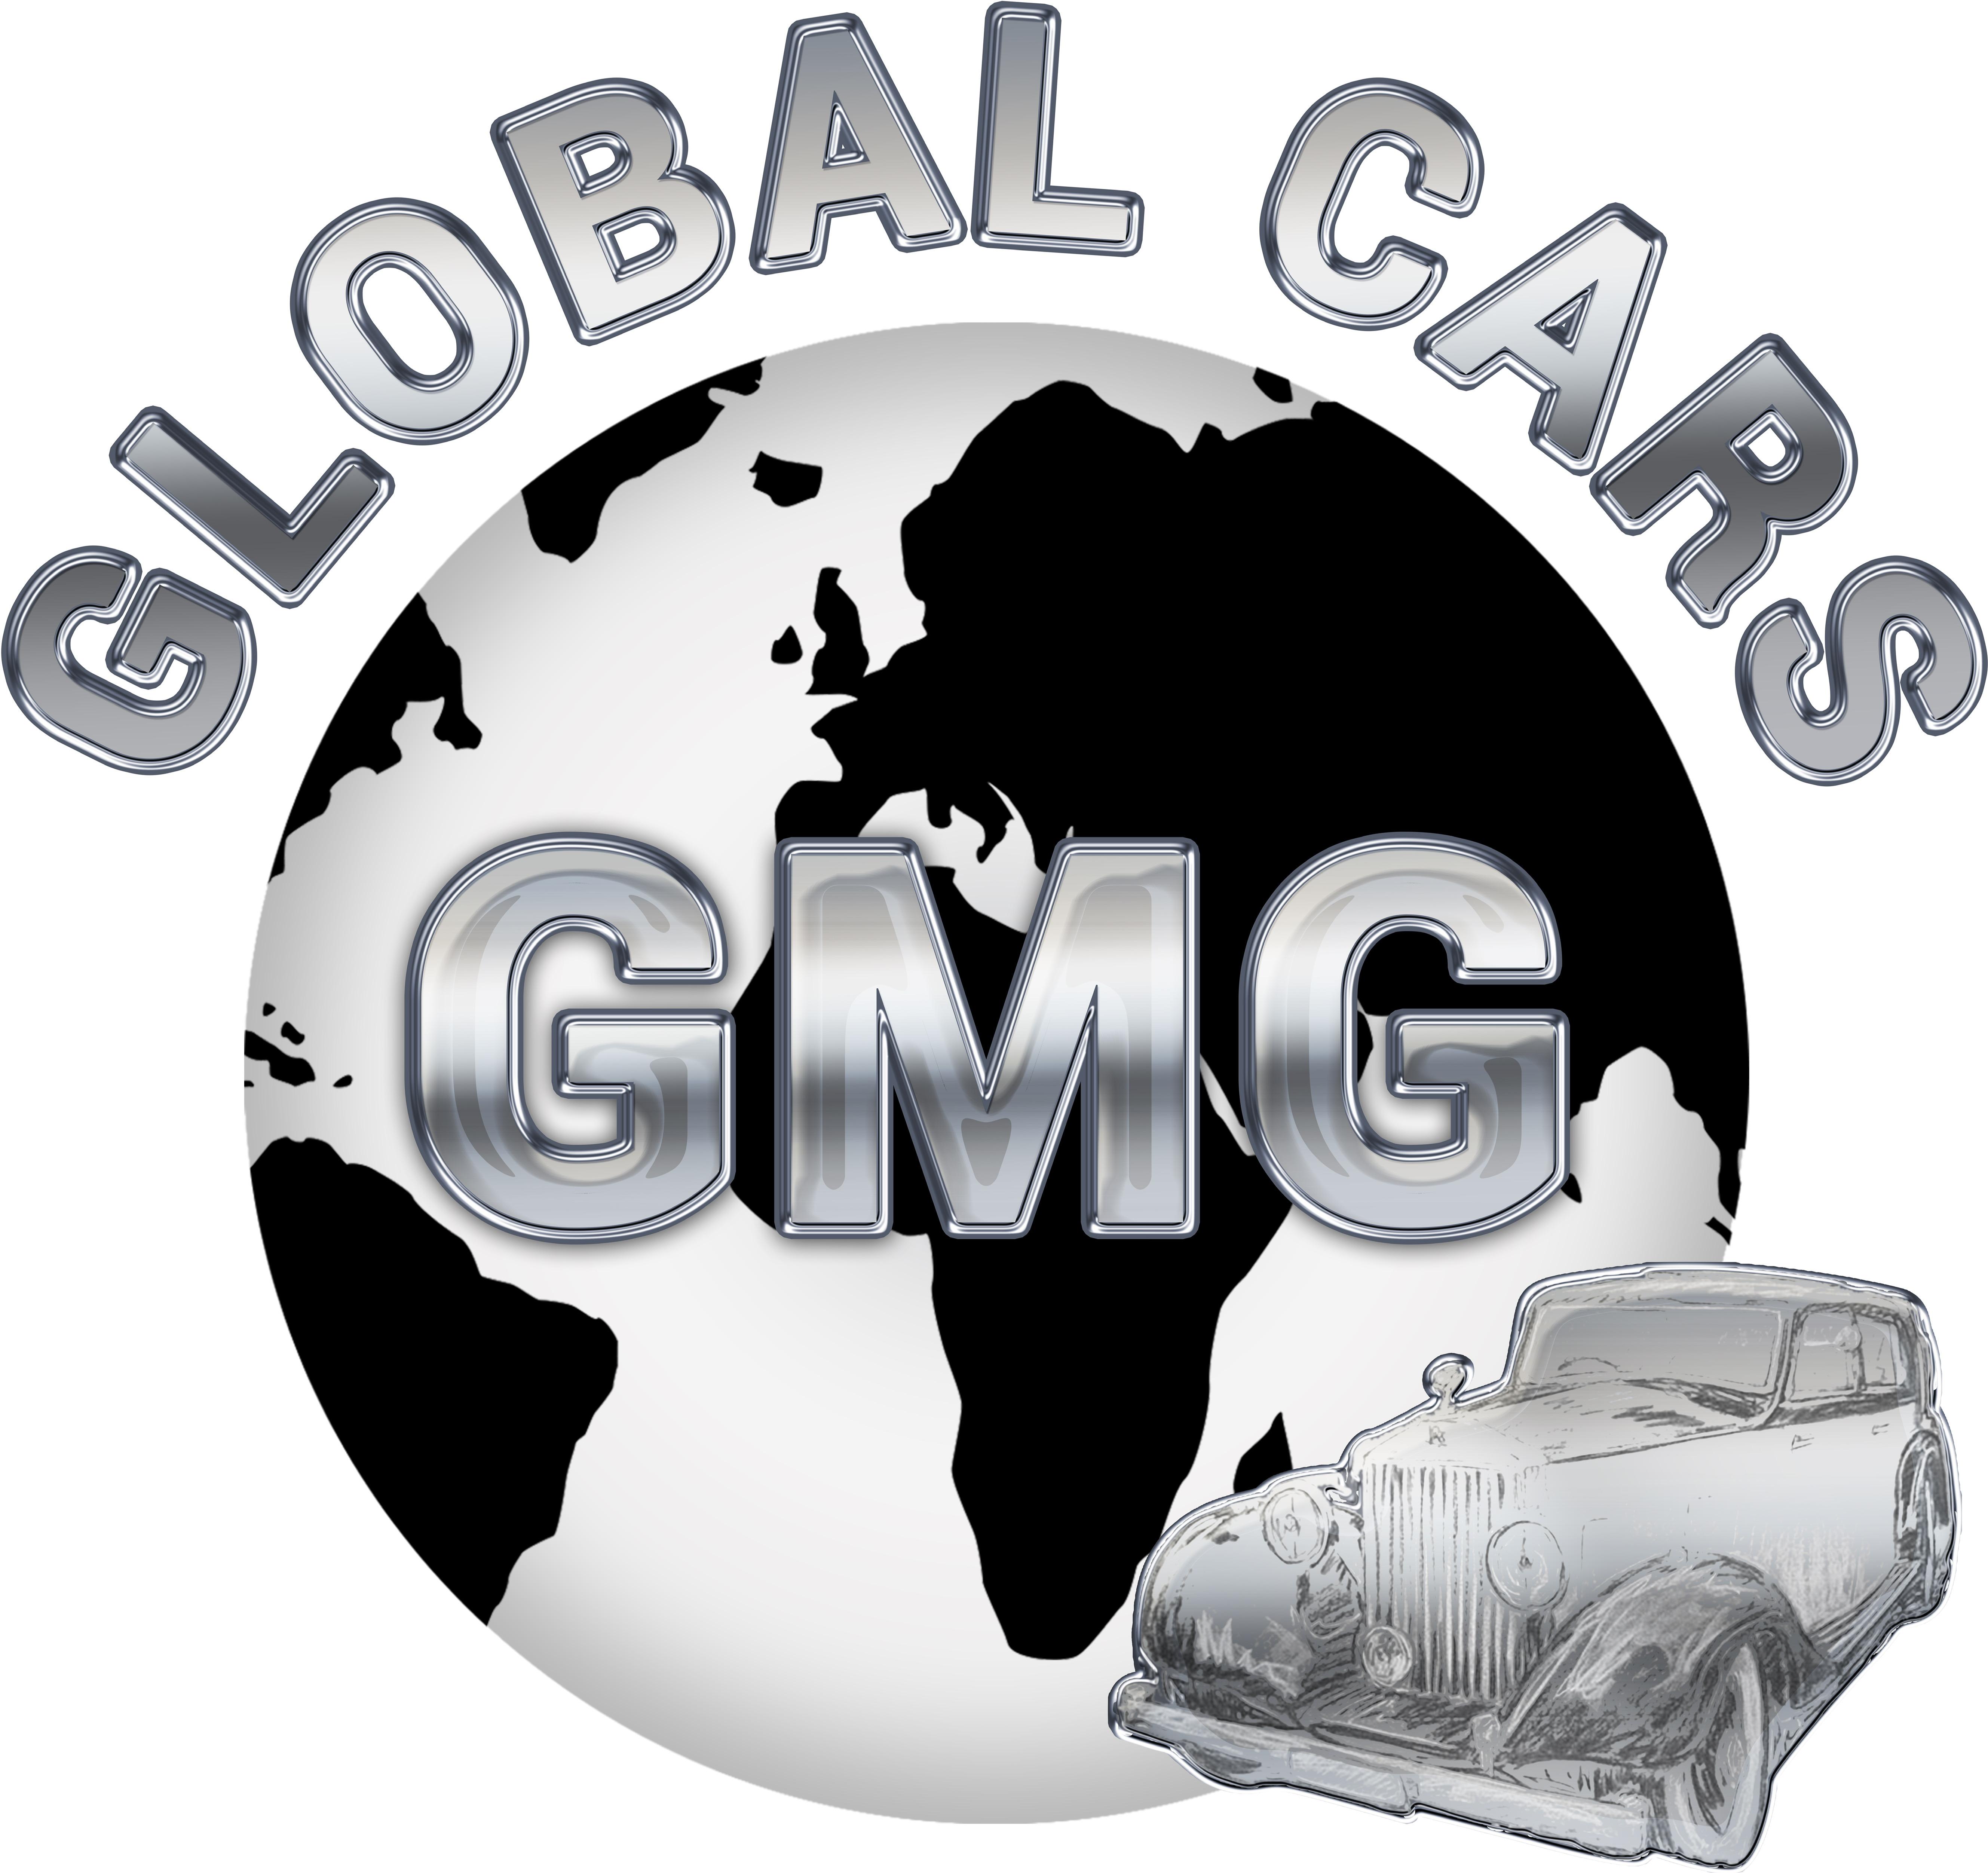 Global Cars Gmg Srl